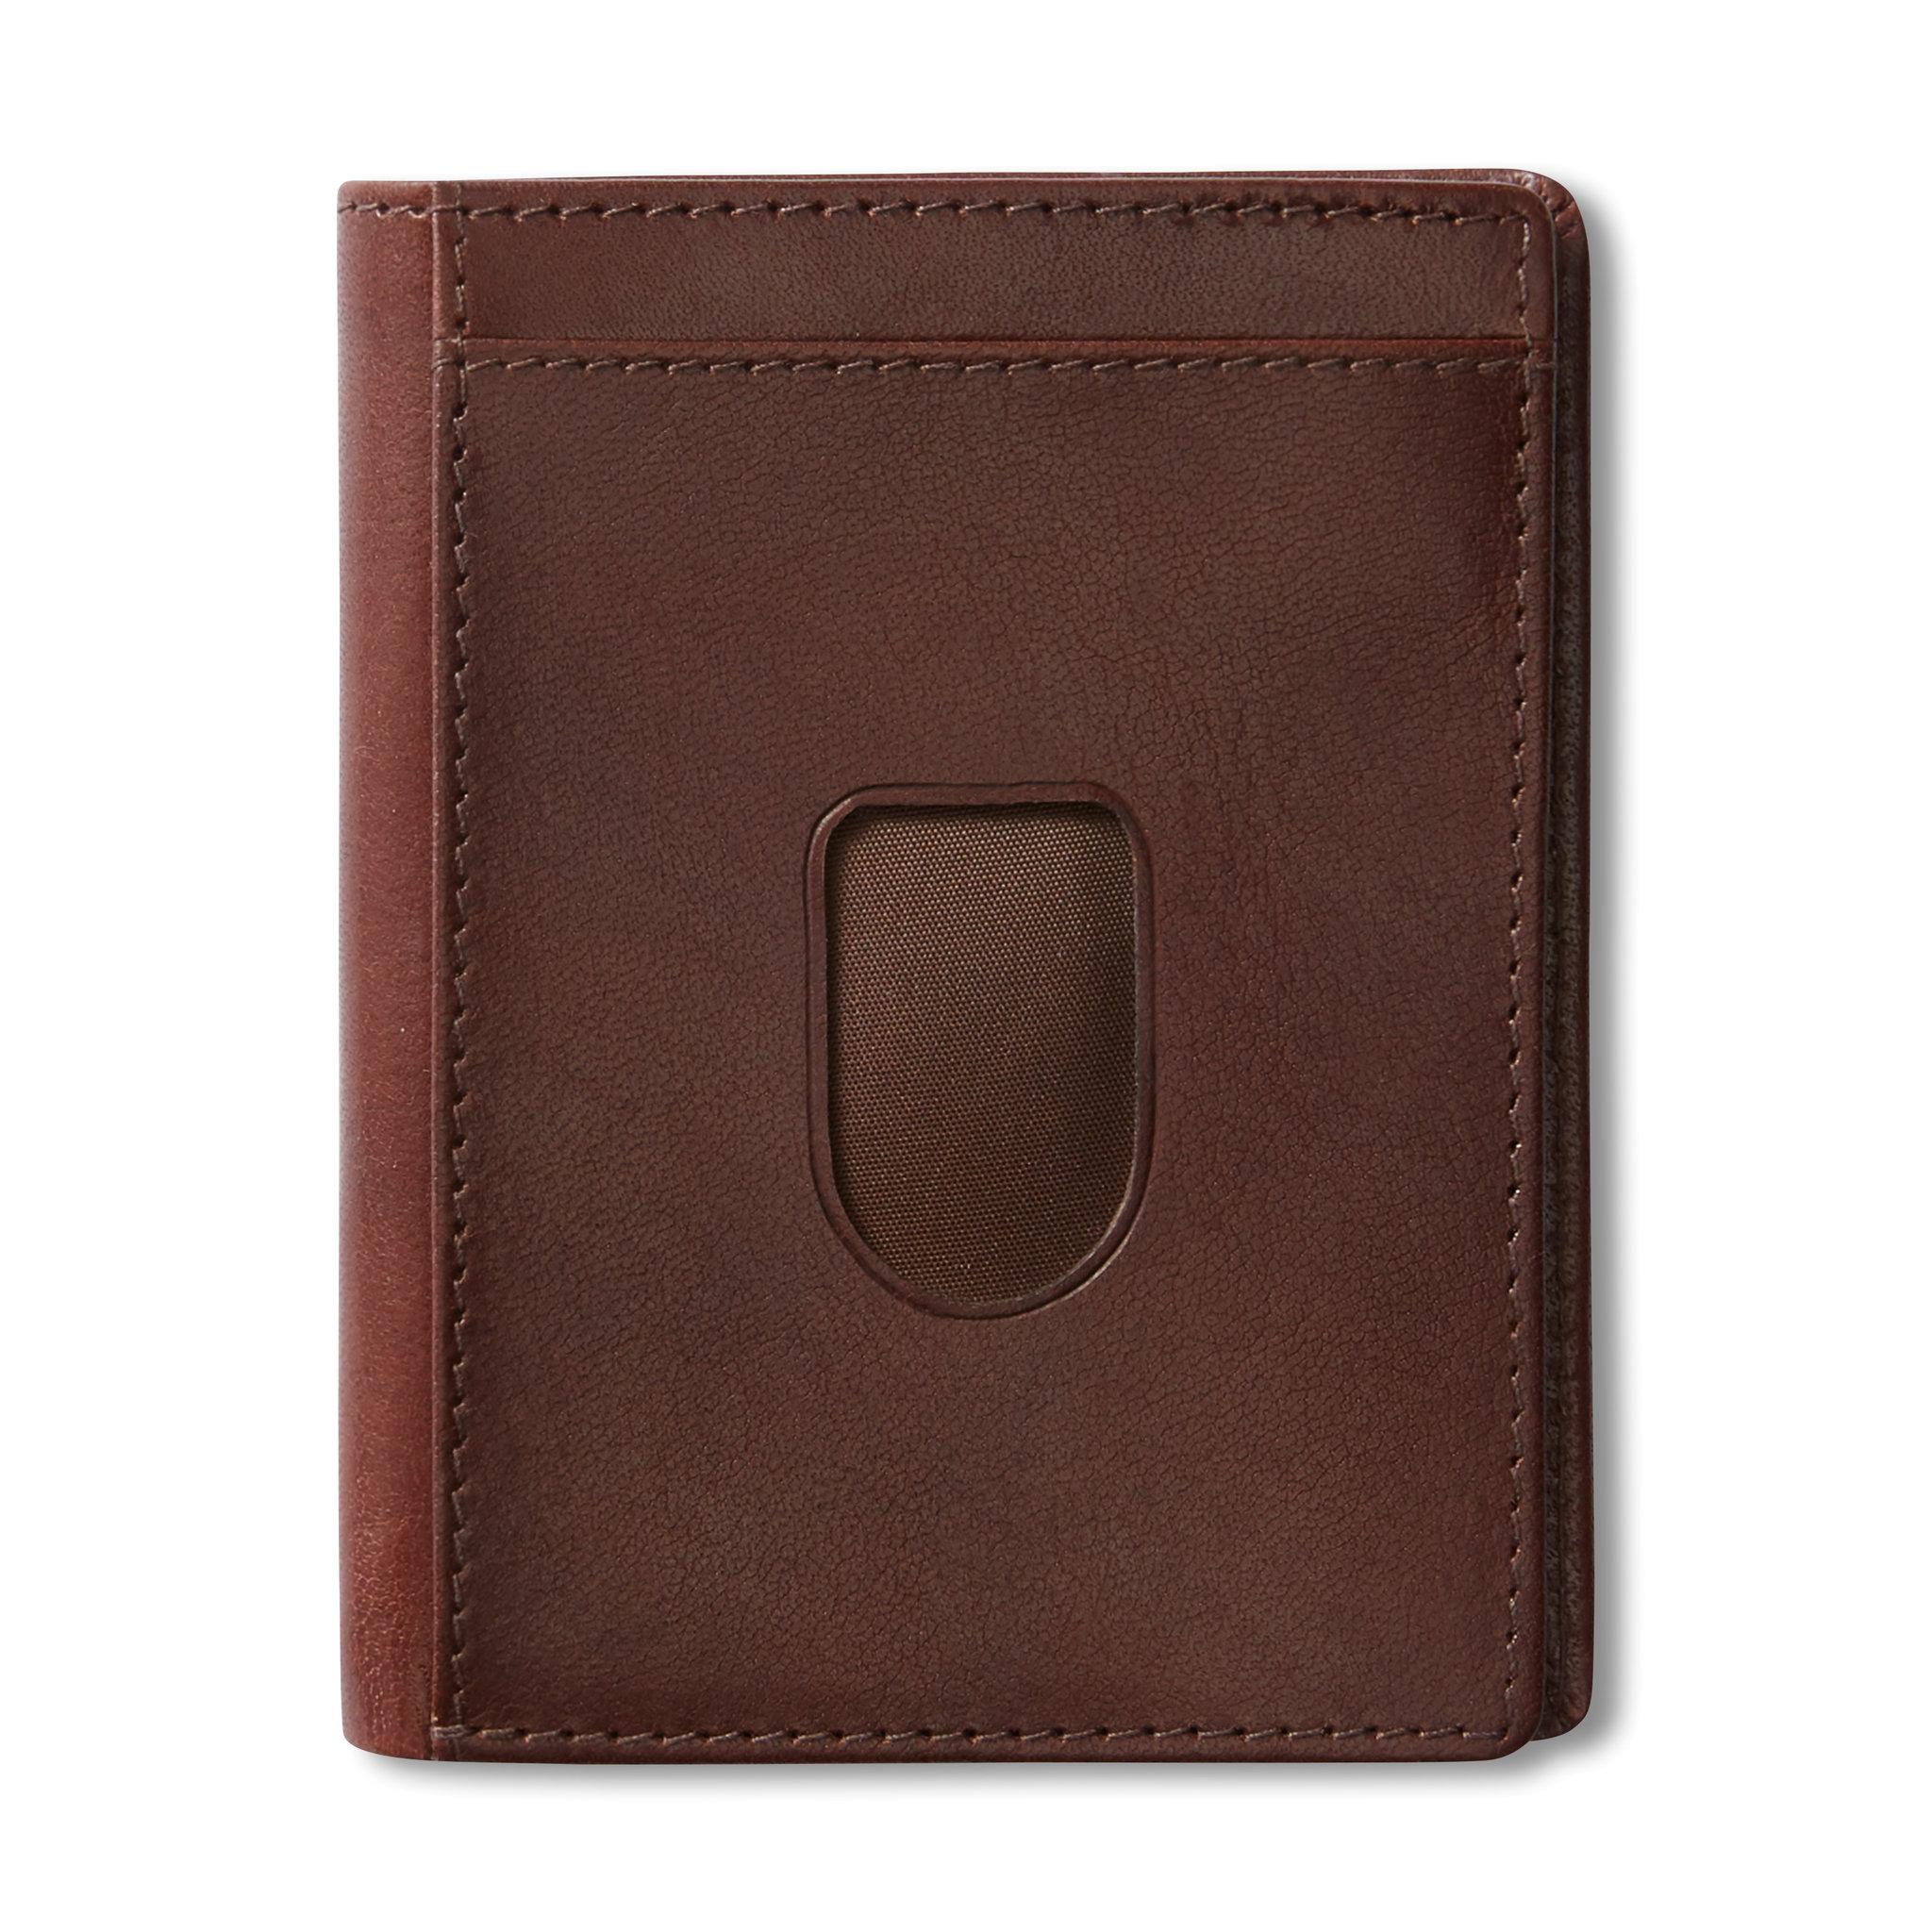 Plånbok i skinn, 7,5x10 cm